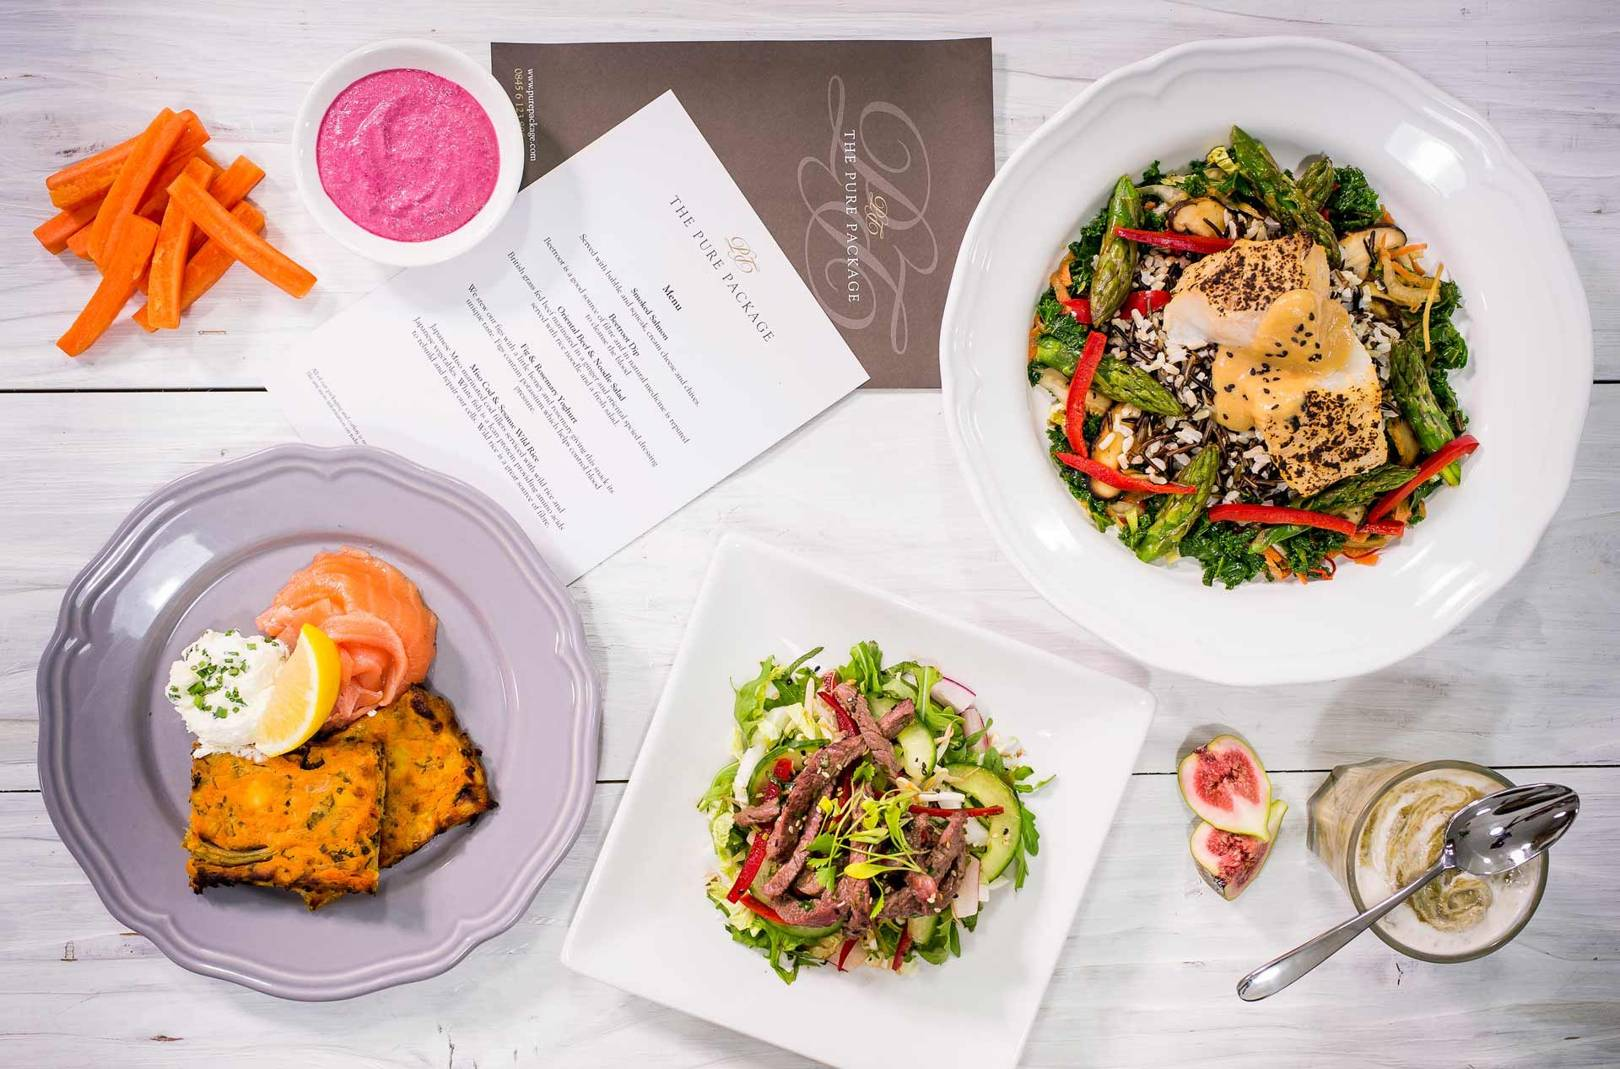 Banting diet weekly meal plans